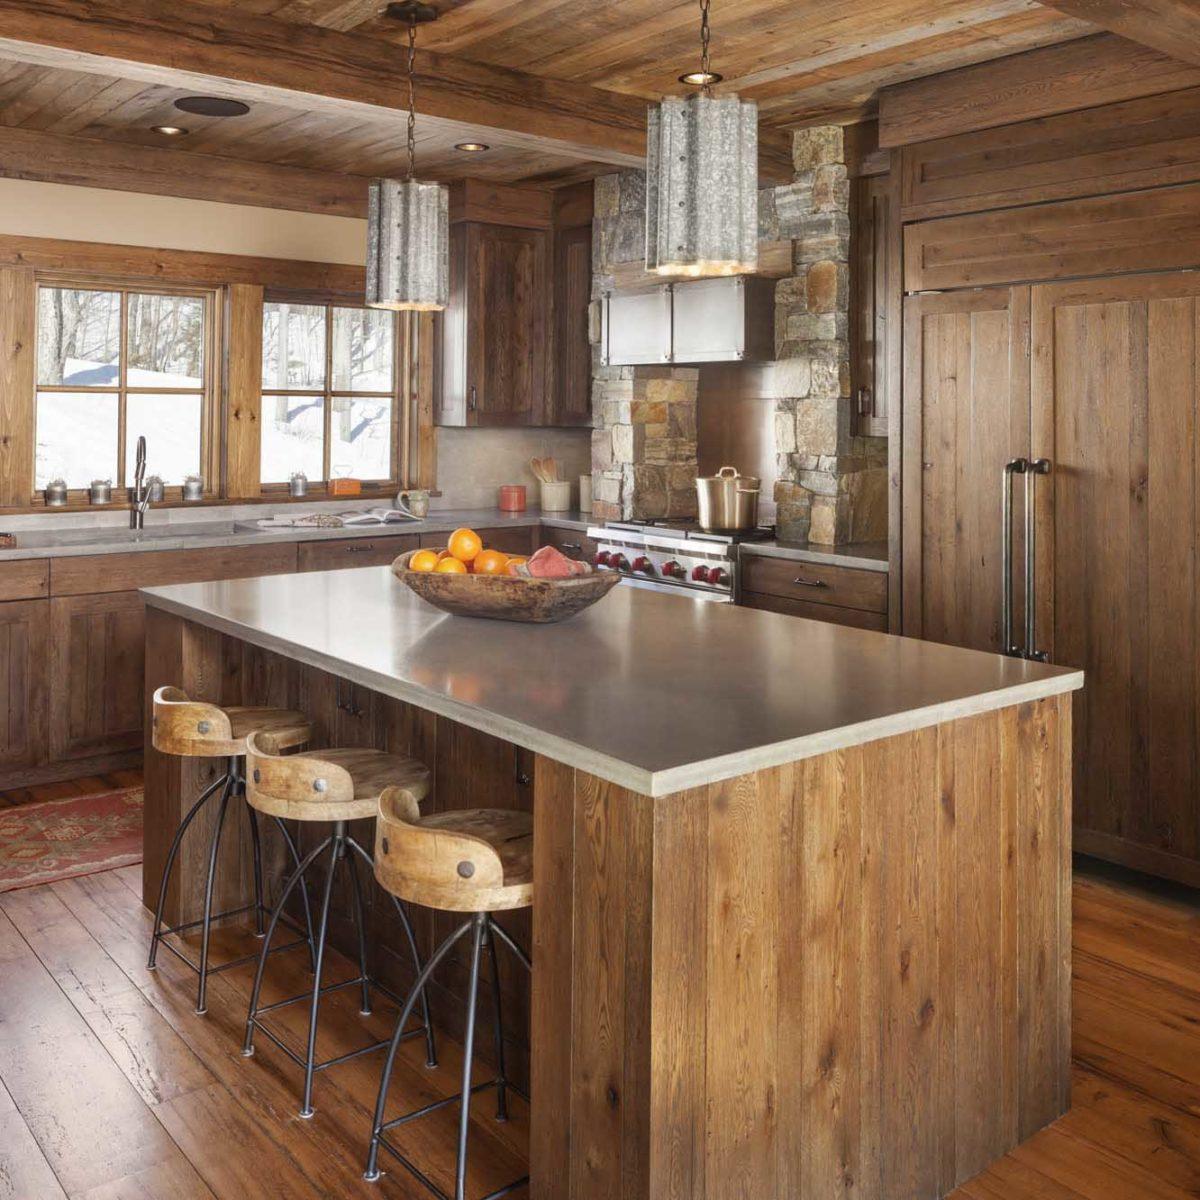 Reclaimed White Oak Flooring in Private Home